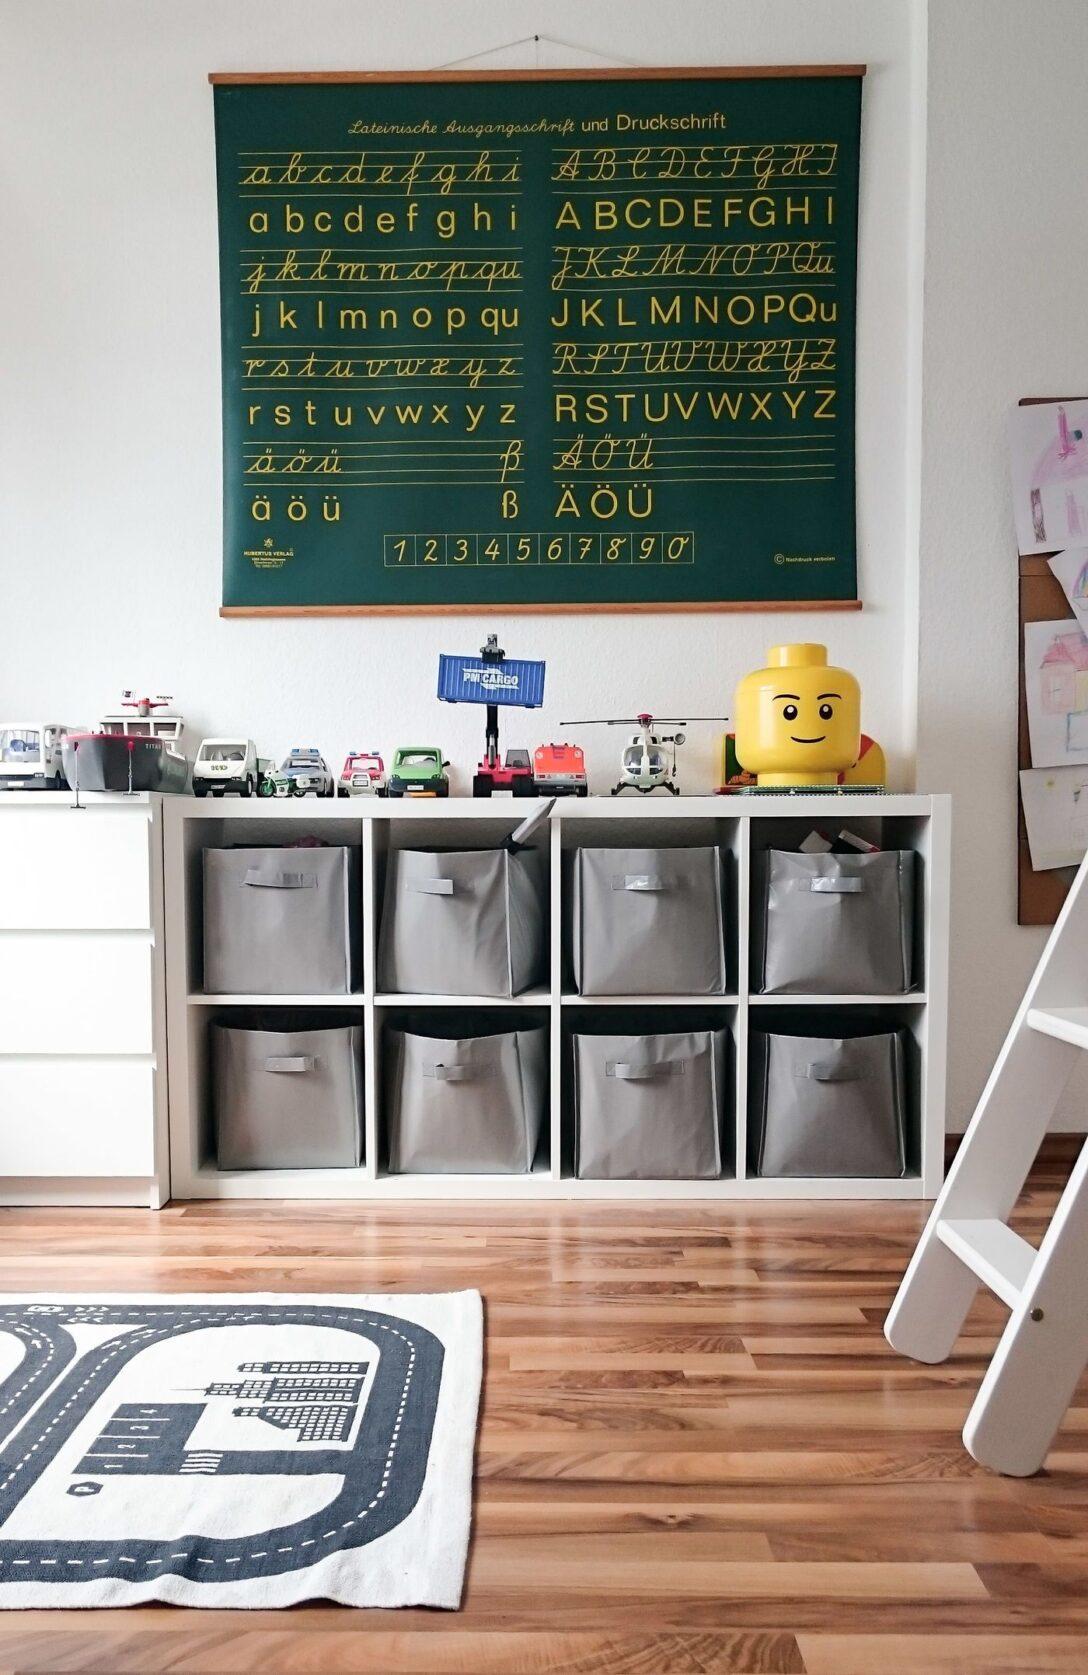 Large Size of Aufbewahrung Regal Kinderzimmer Ikea Gebraucht Aufbewahrungskorb Mint Ideen Aufbewahrungssystem Aufbewahrungsregal Gross Aufbewahrungsboxen Aufbewahrungsbox Fr Kinderzimmer Kinderzimmer Aufbewahrung